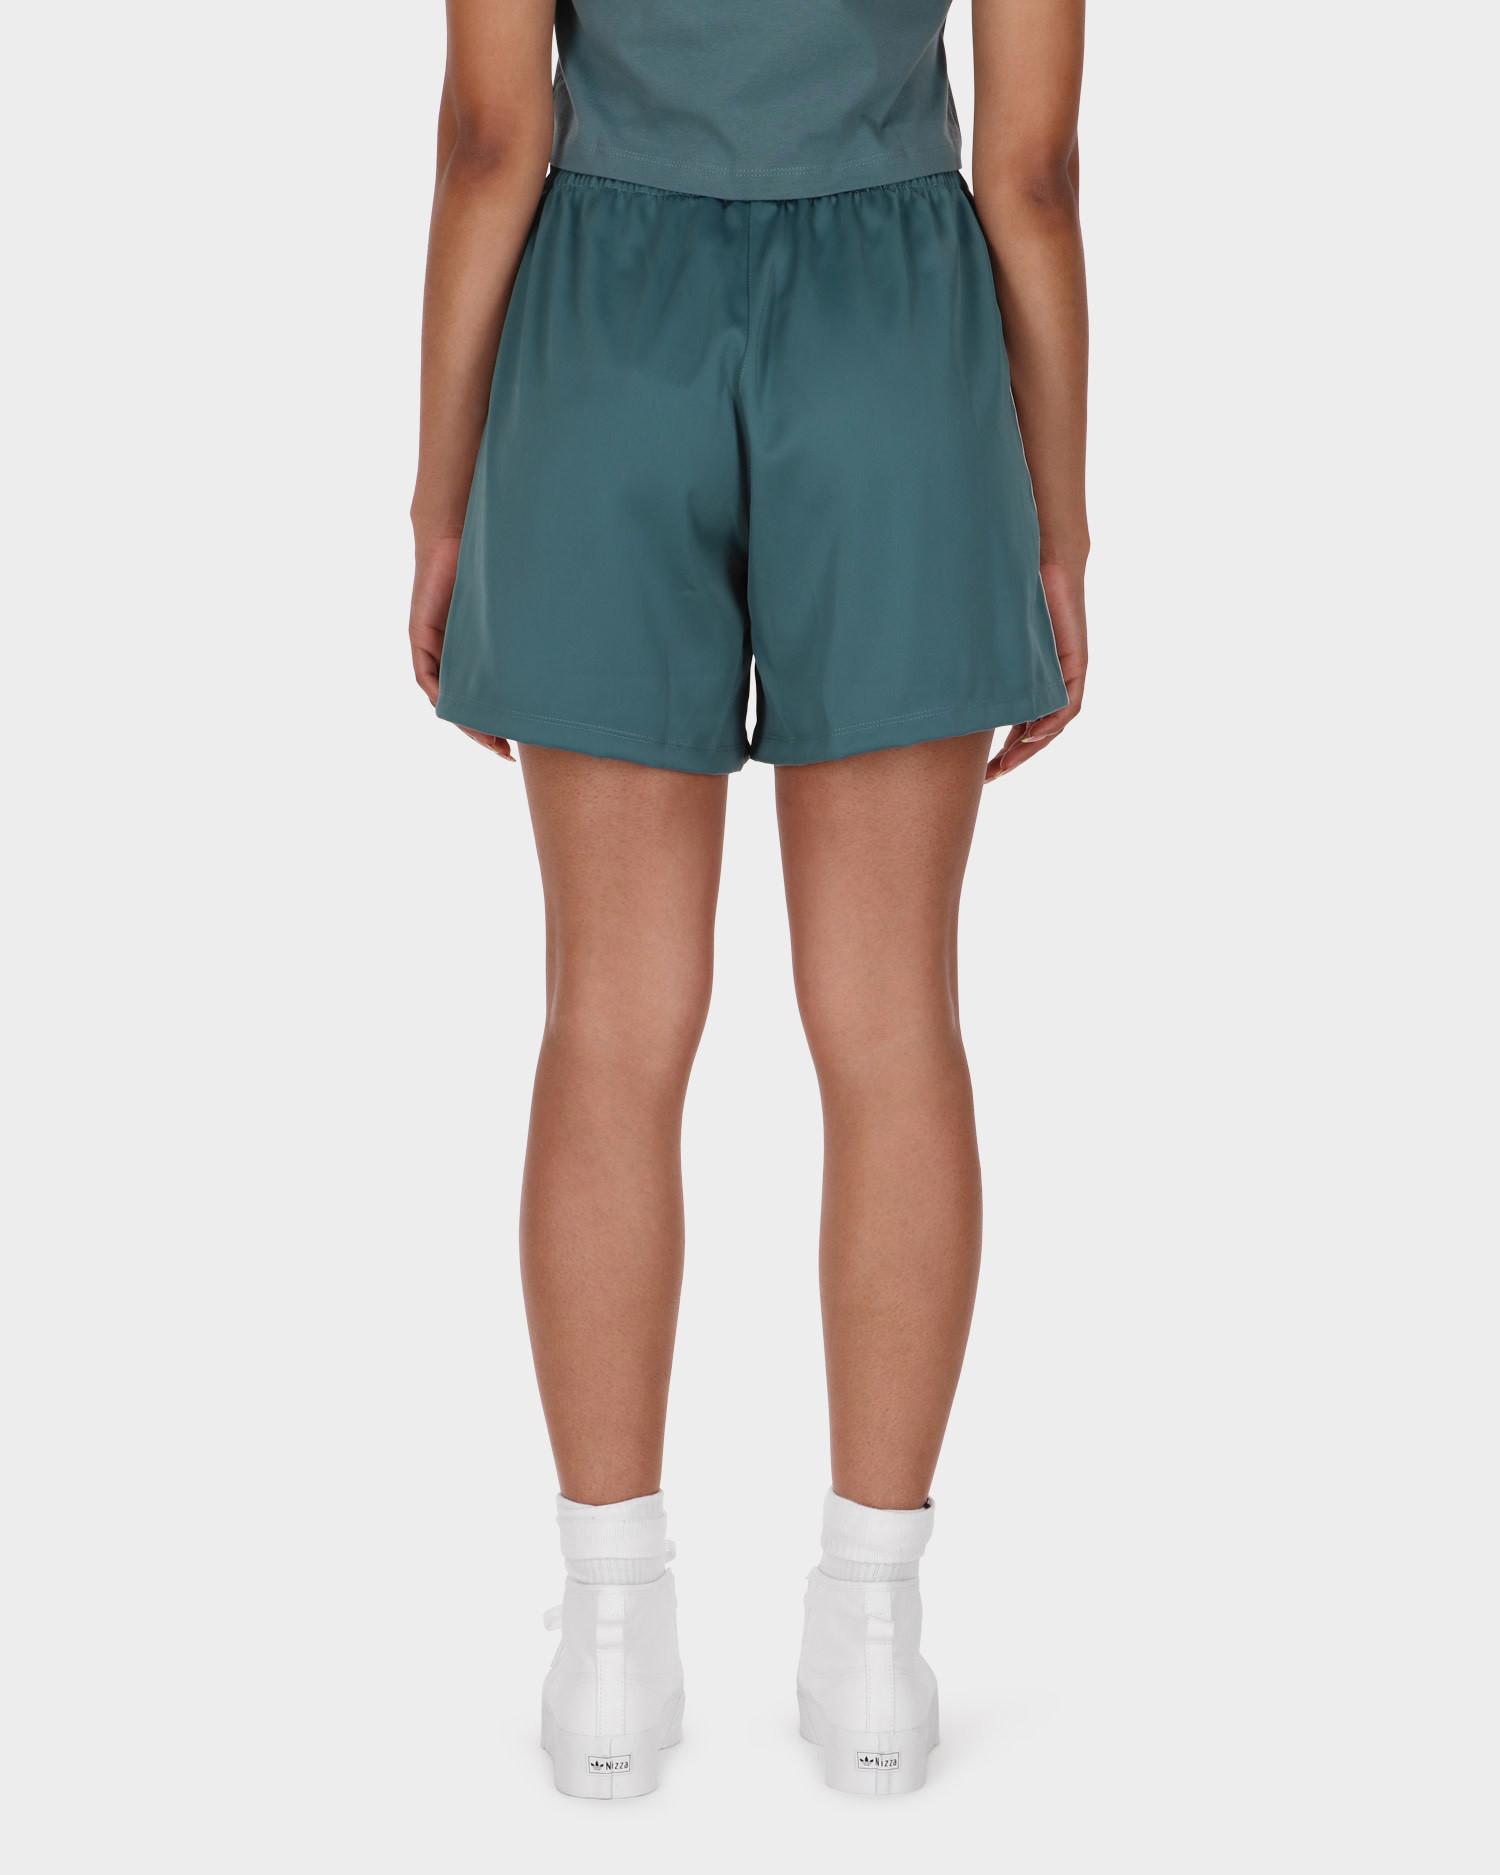 Adidas Satin Shorts Hazeme Emubru